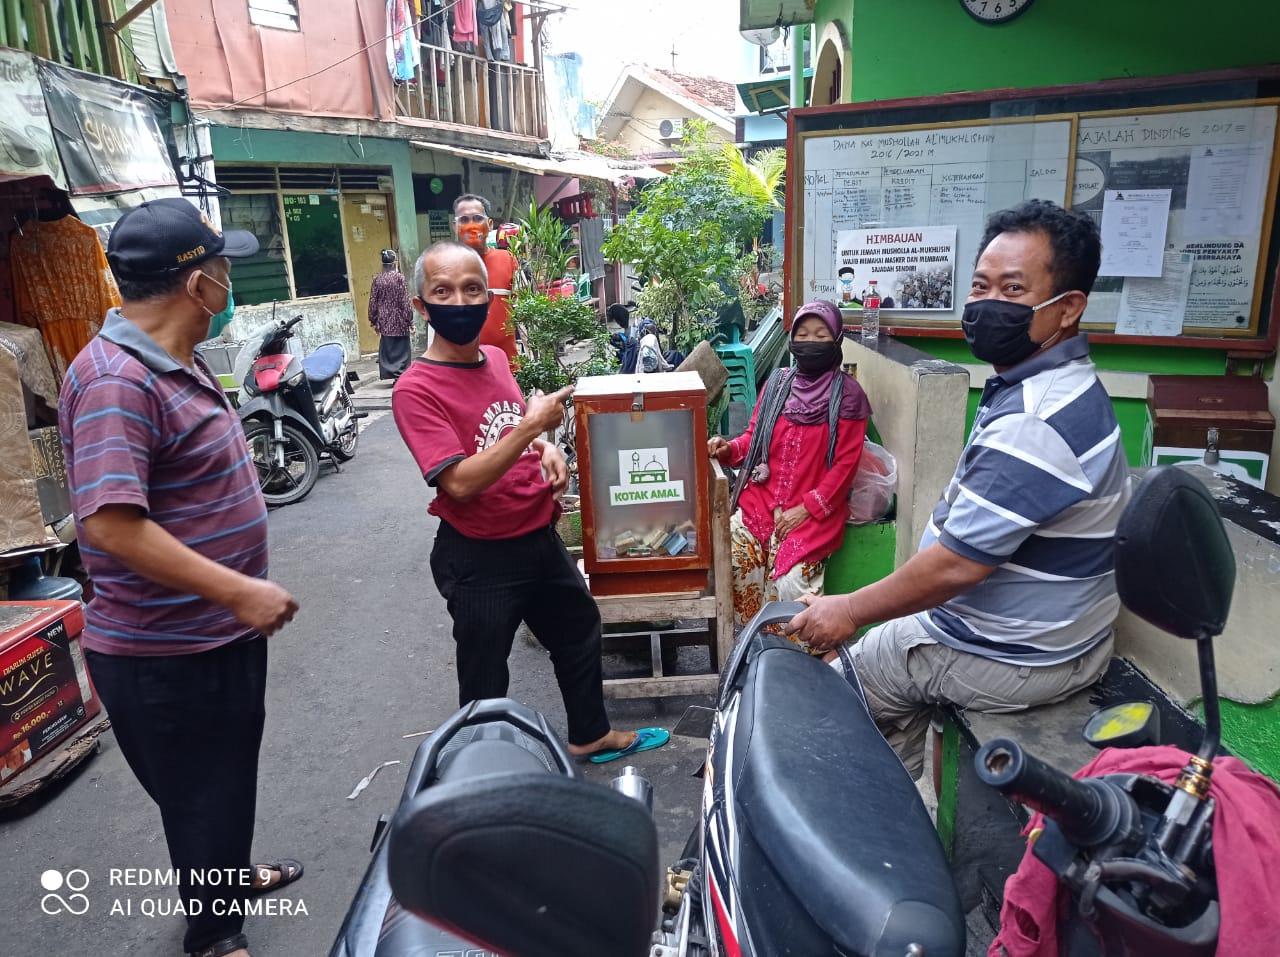 Sosialisasi Masker Warga RW 05 Keagungan Taman Sari Jakarta Barat